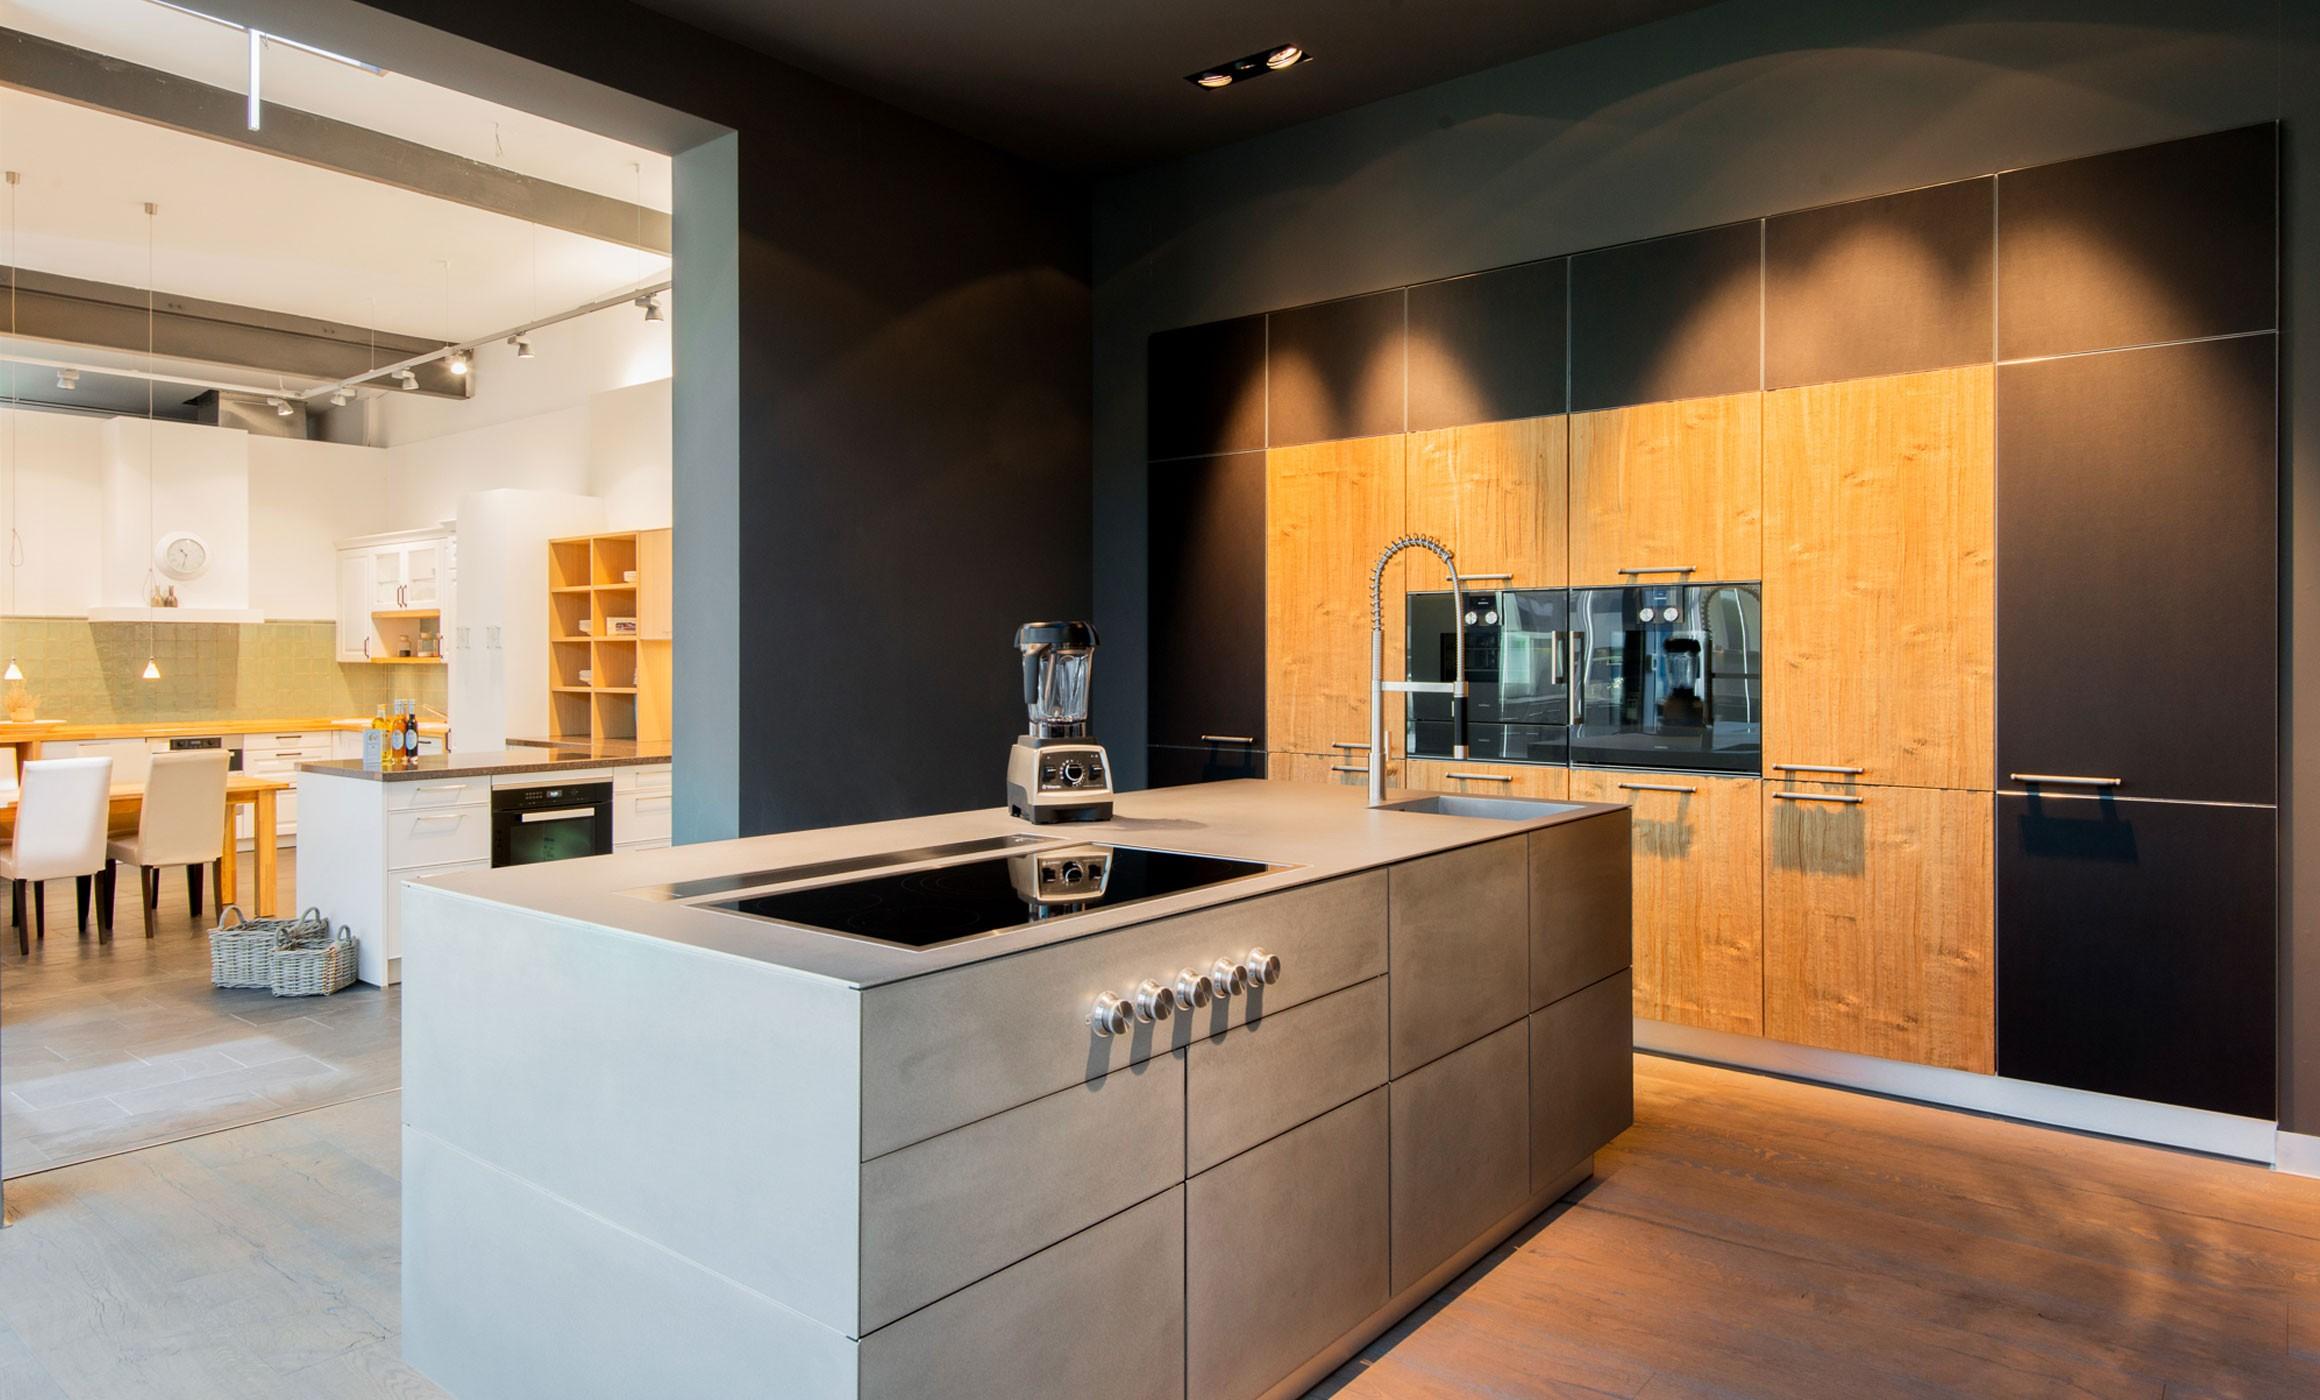 Hummel Kuchen 2019 Test Preise Qualitat Musterkuchen